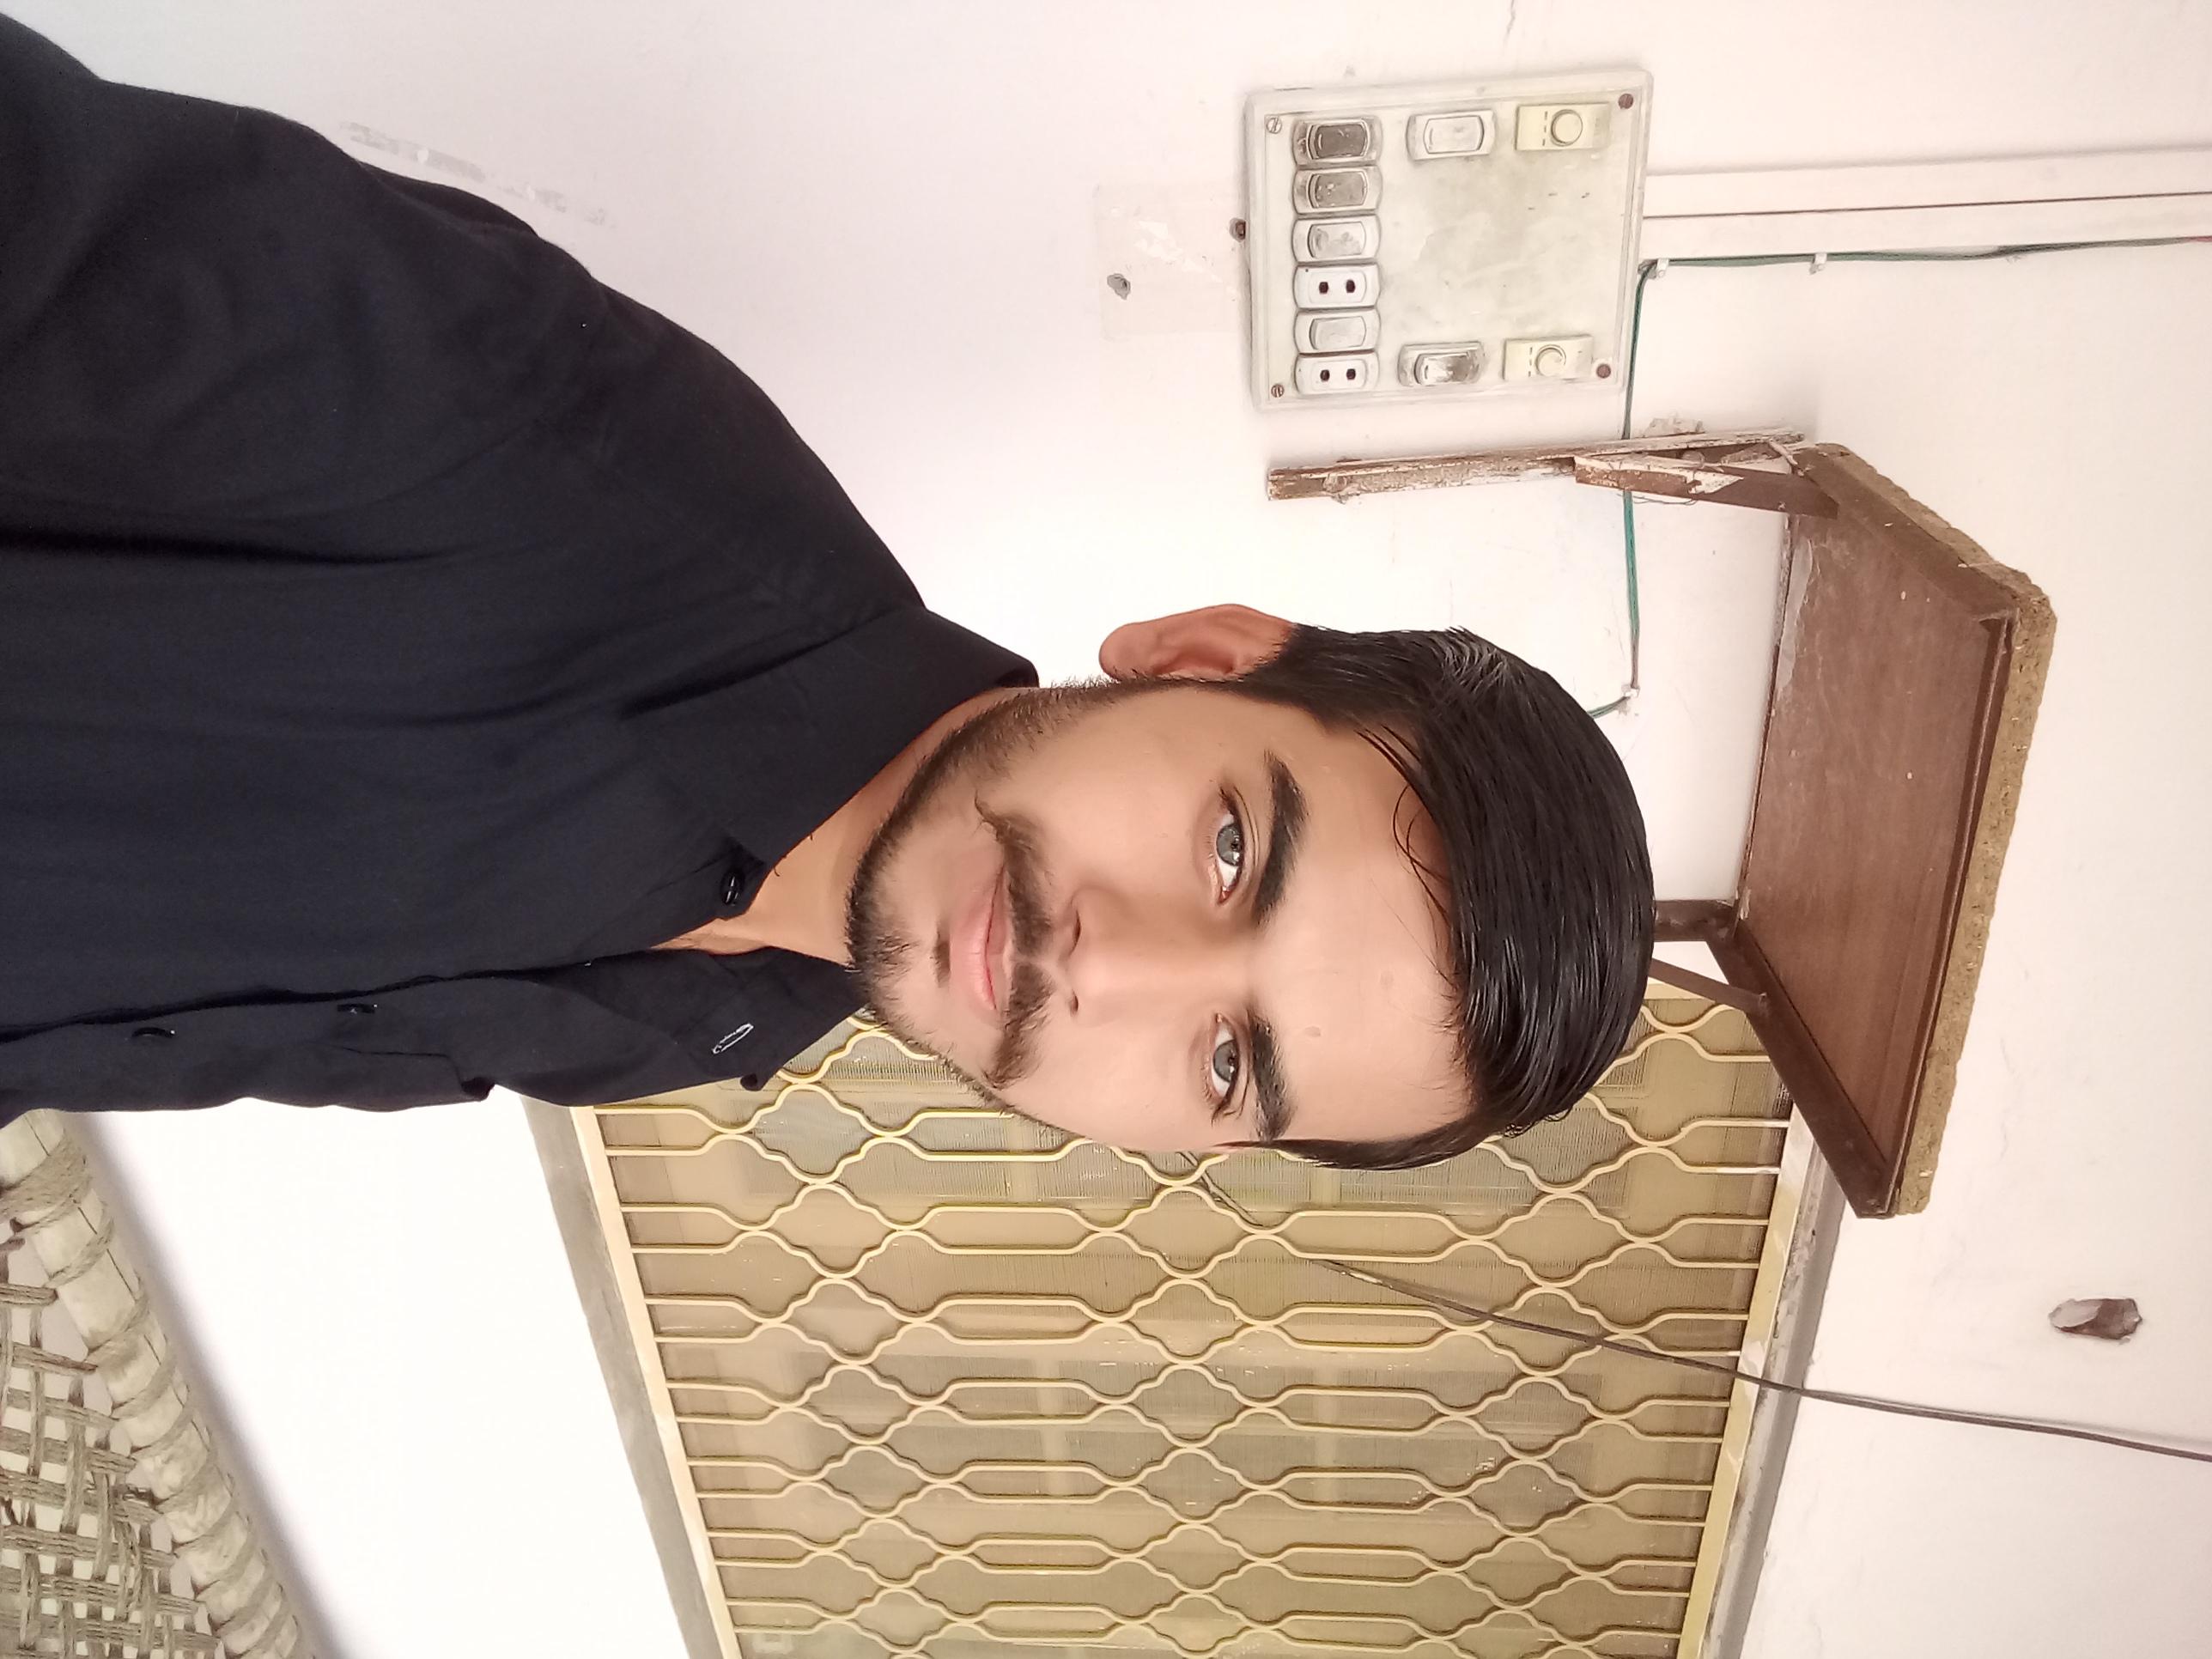 Muhammad Shahzeb